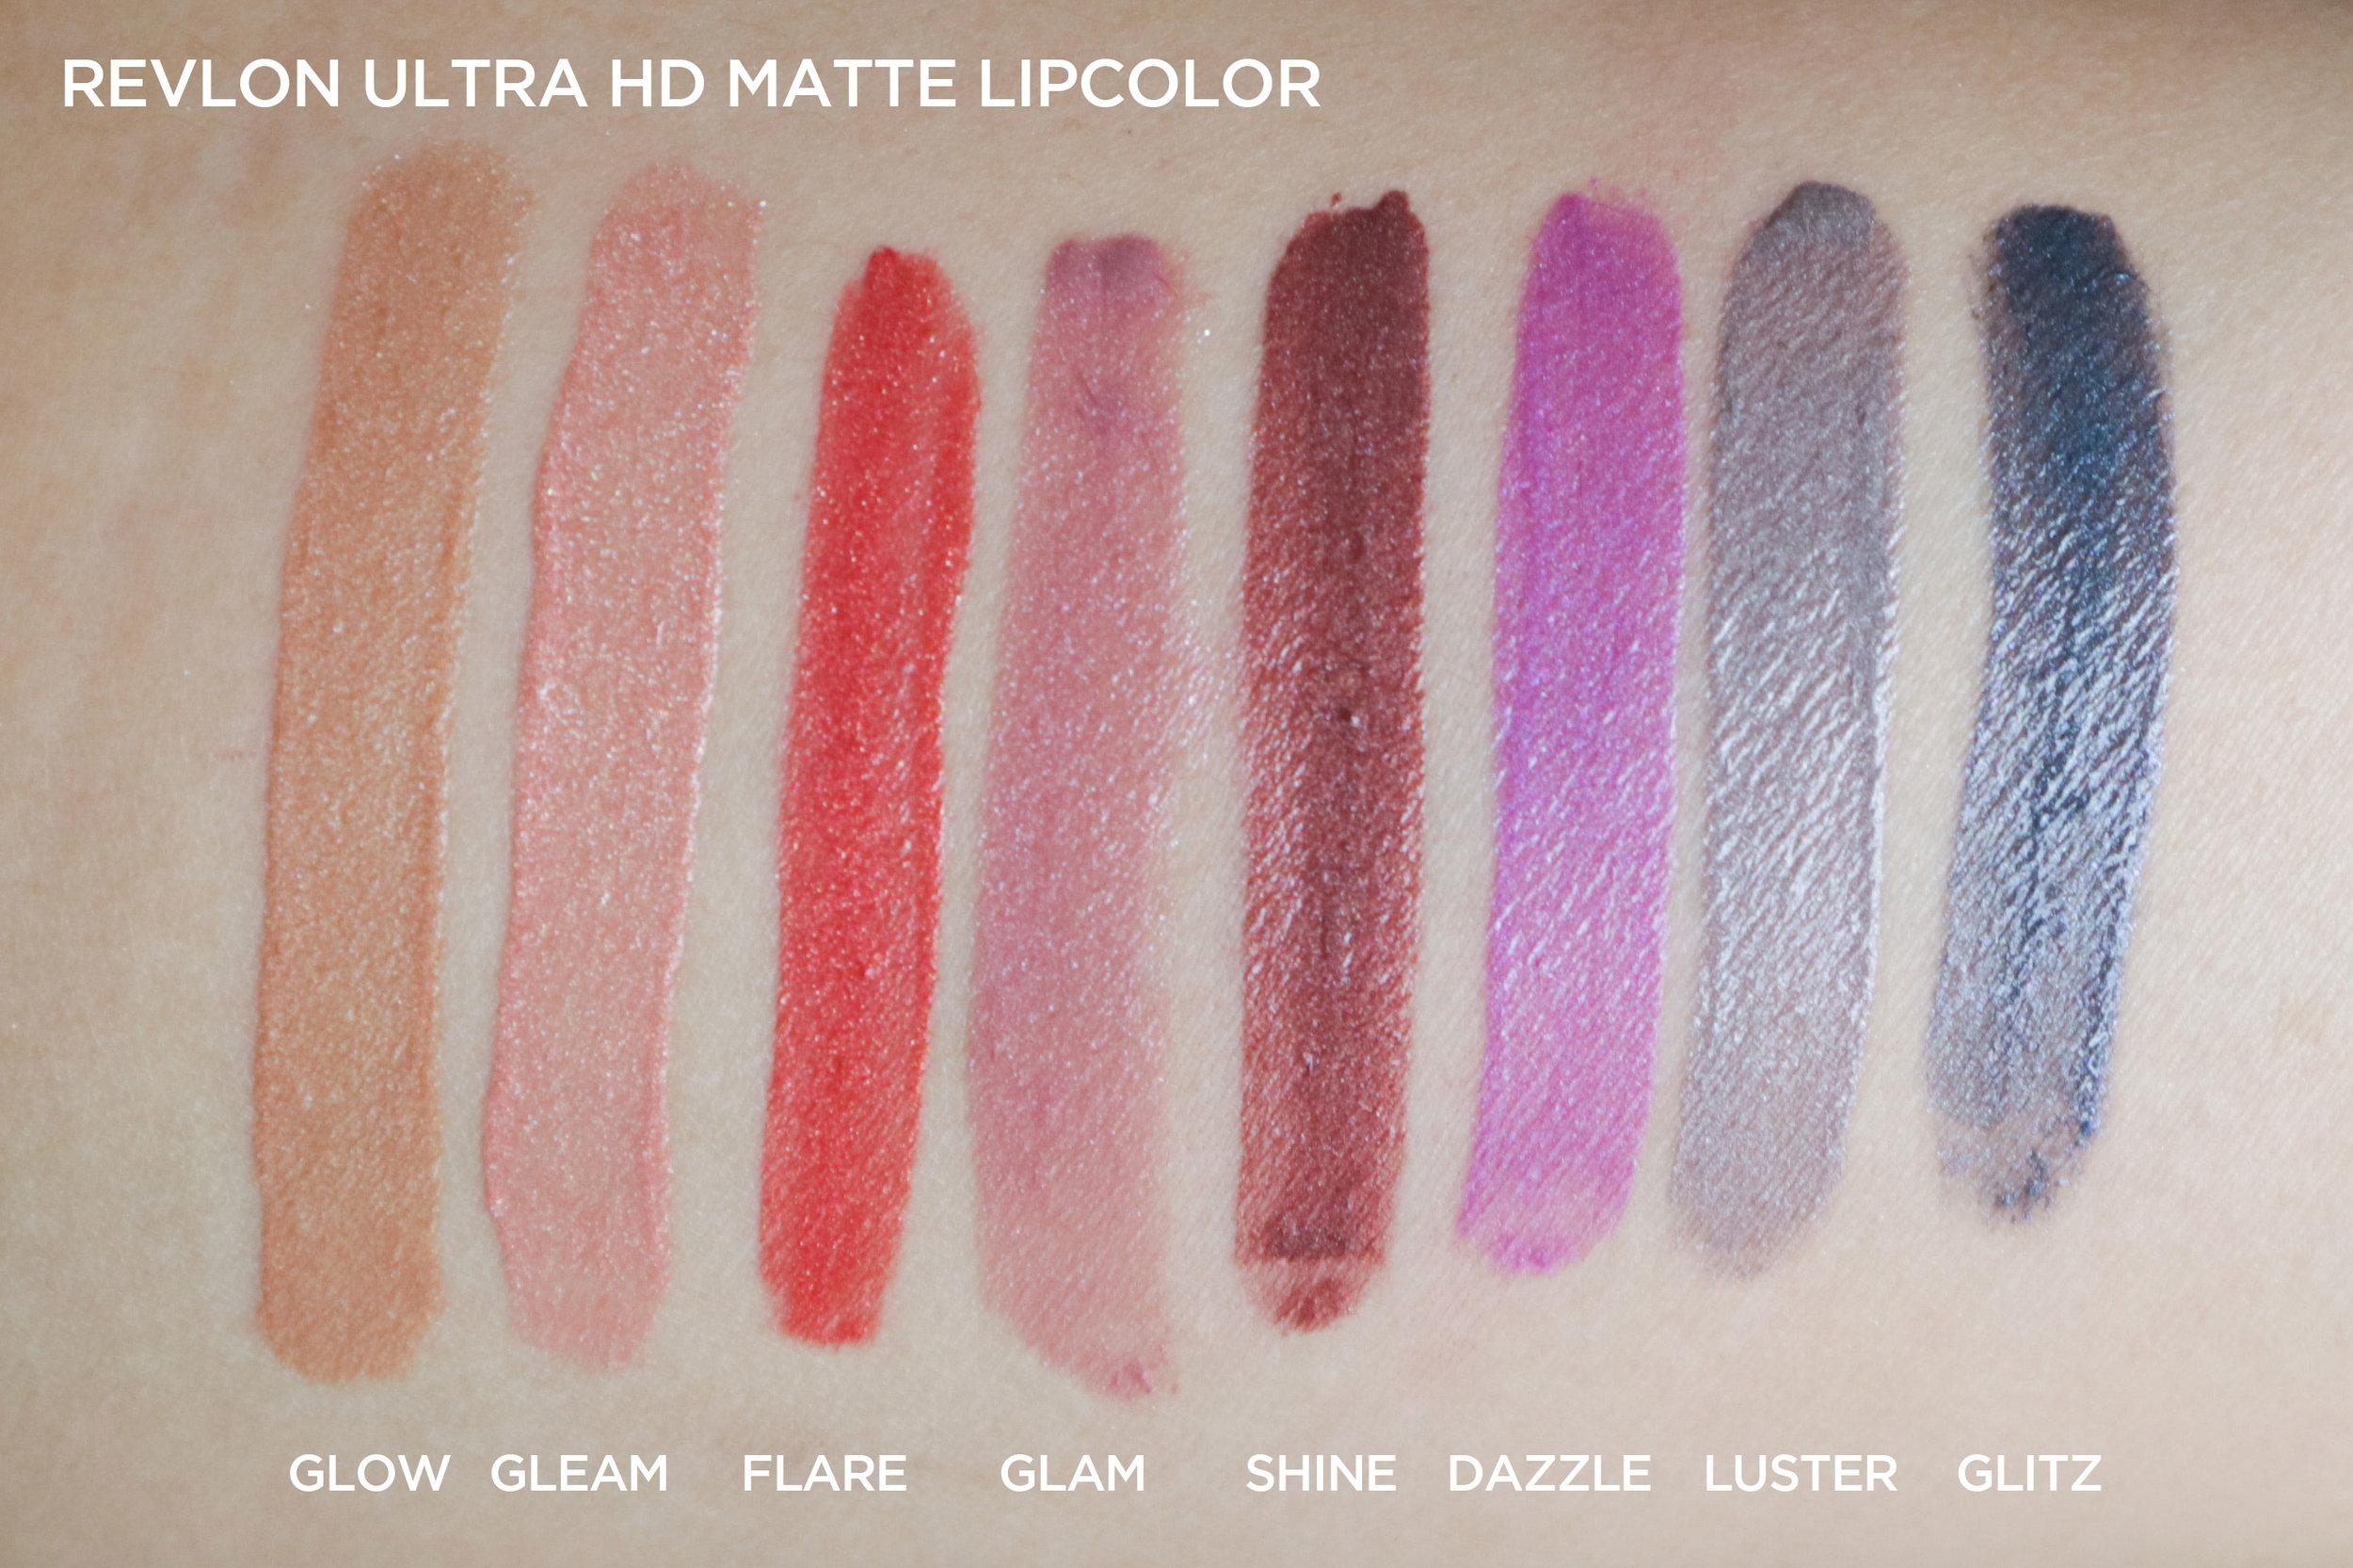 1712-Revlon-Ultra-HD-Matte-Lipcolor-Swatches.jpg